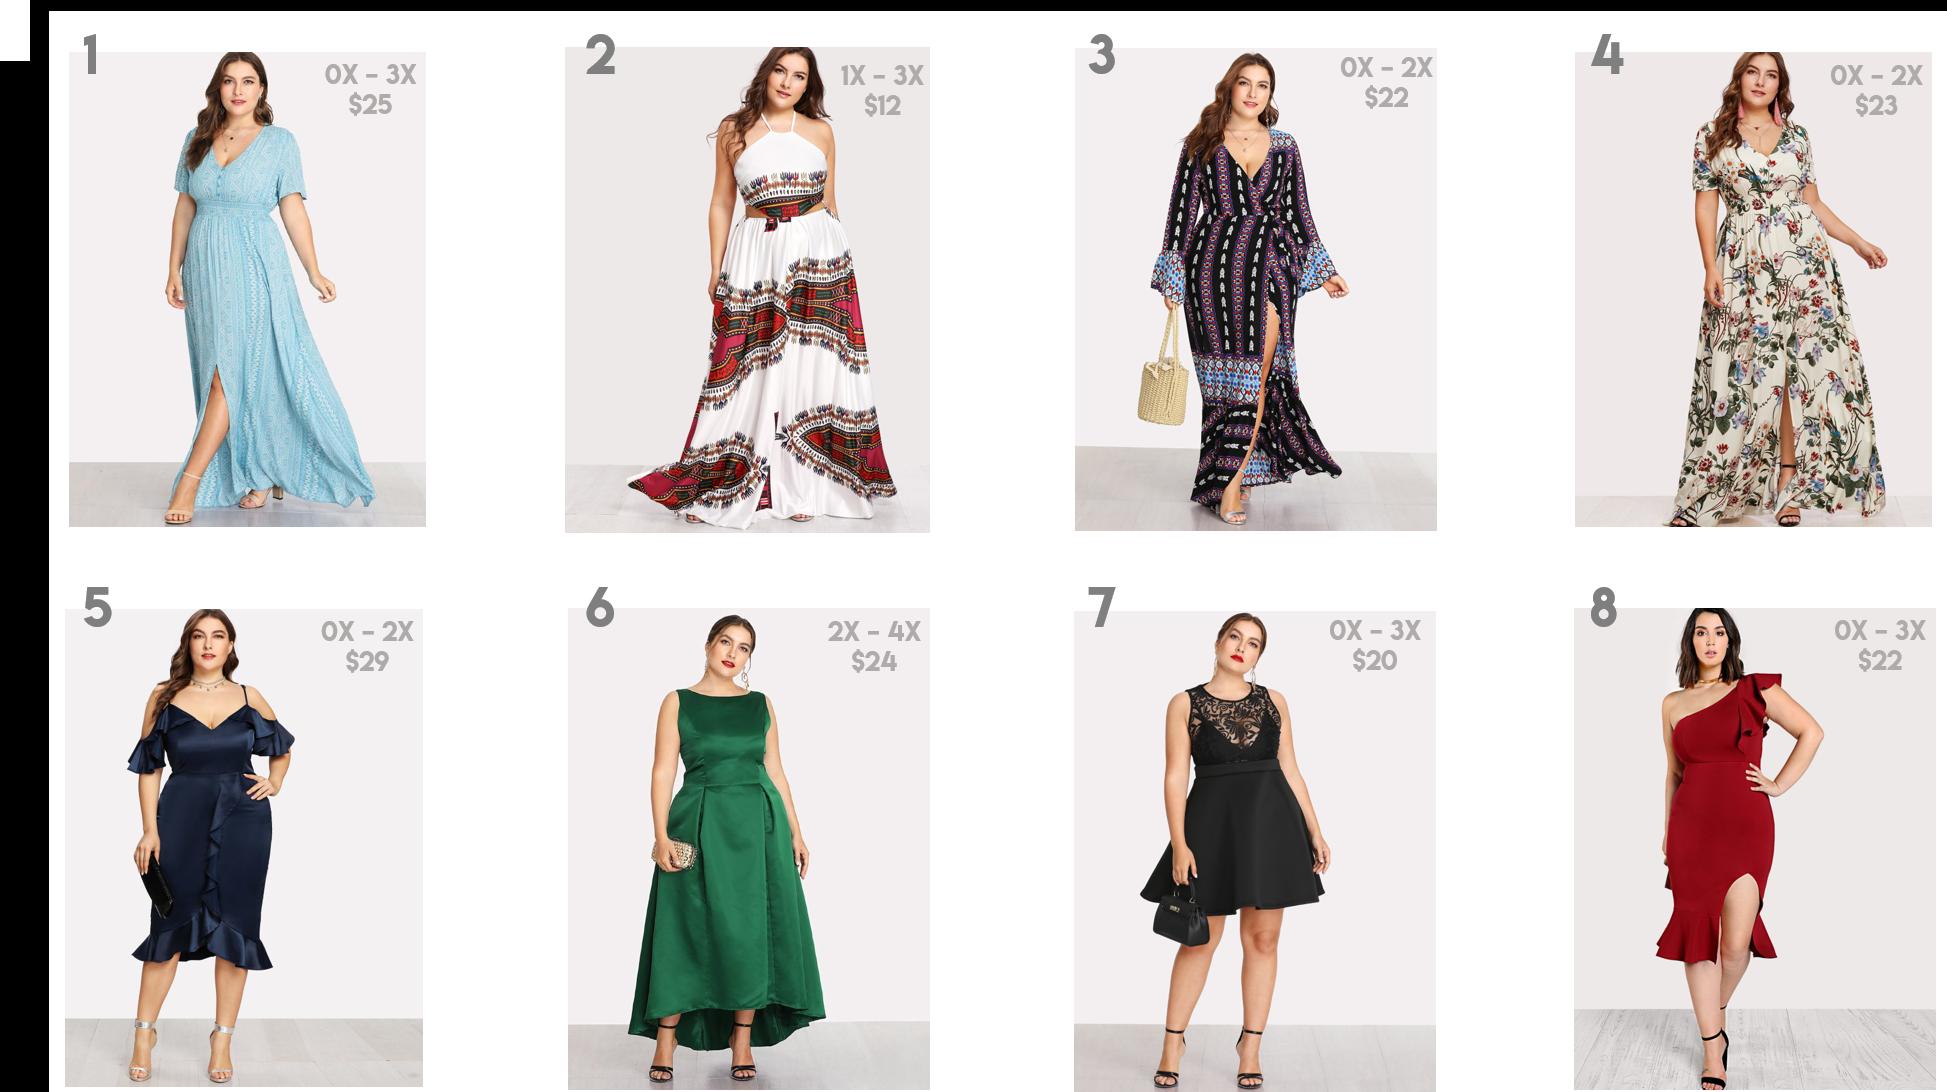 Dresses1.png